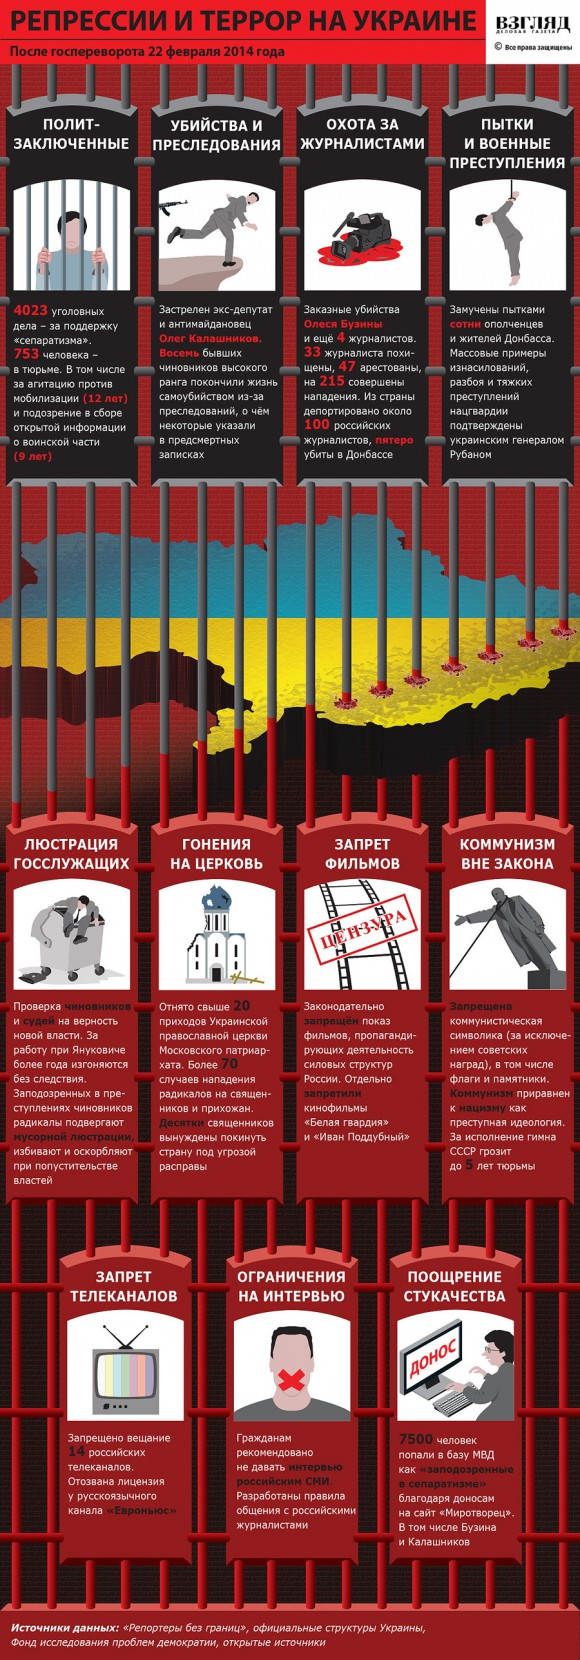 Репрессии и террор на Украине